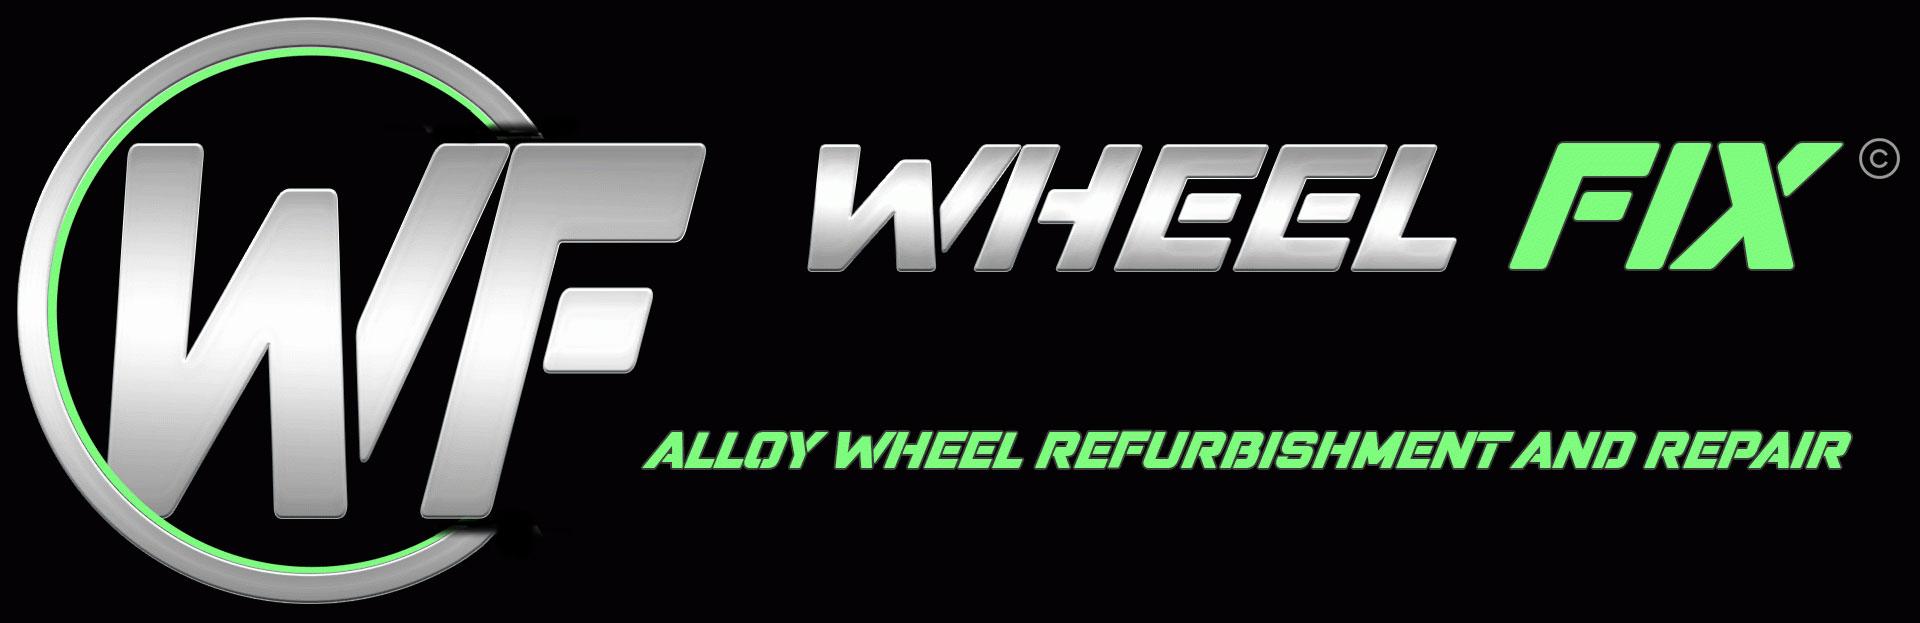 wheel fix black bg